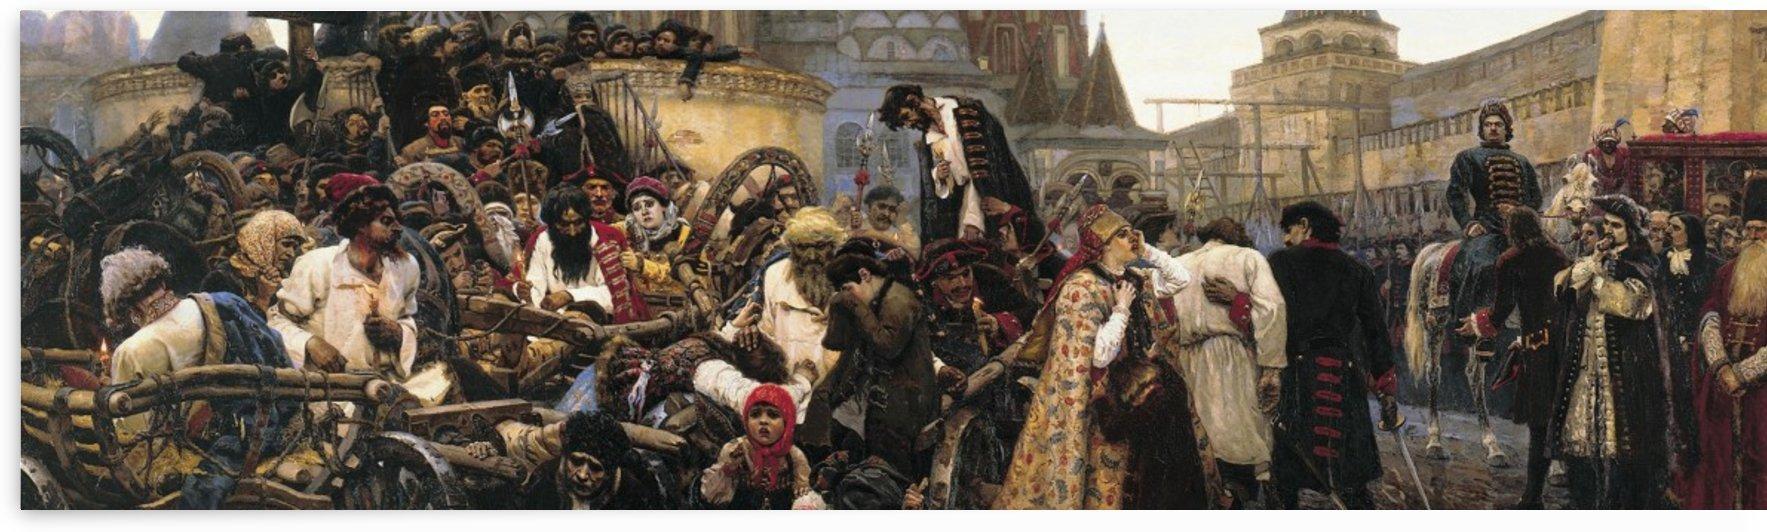 Morning Strelets'execution by Vasily Surikov